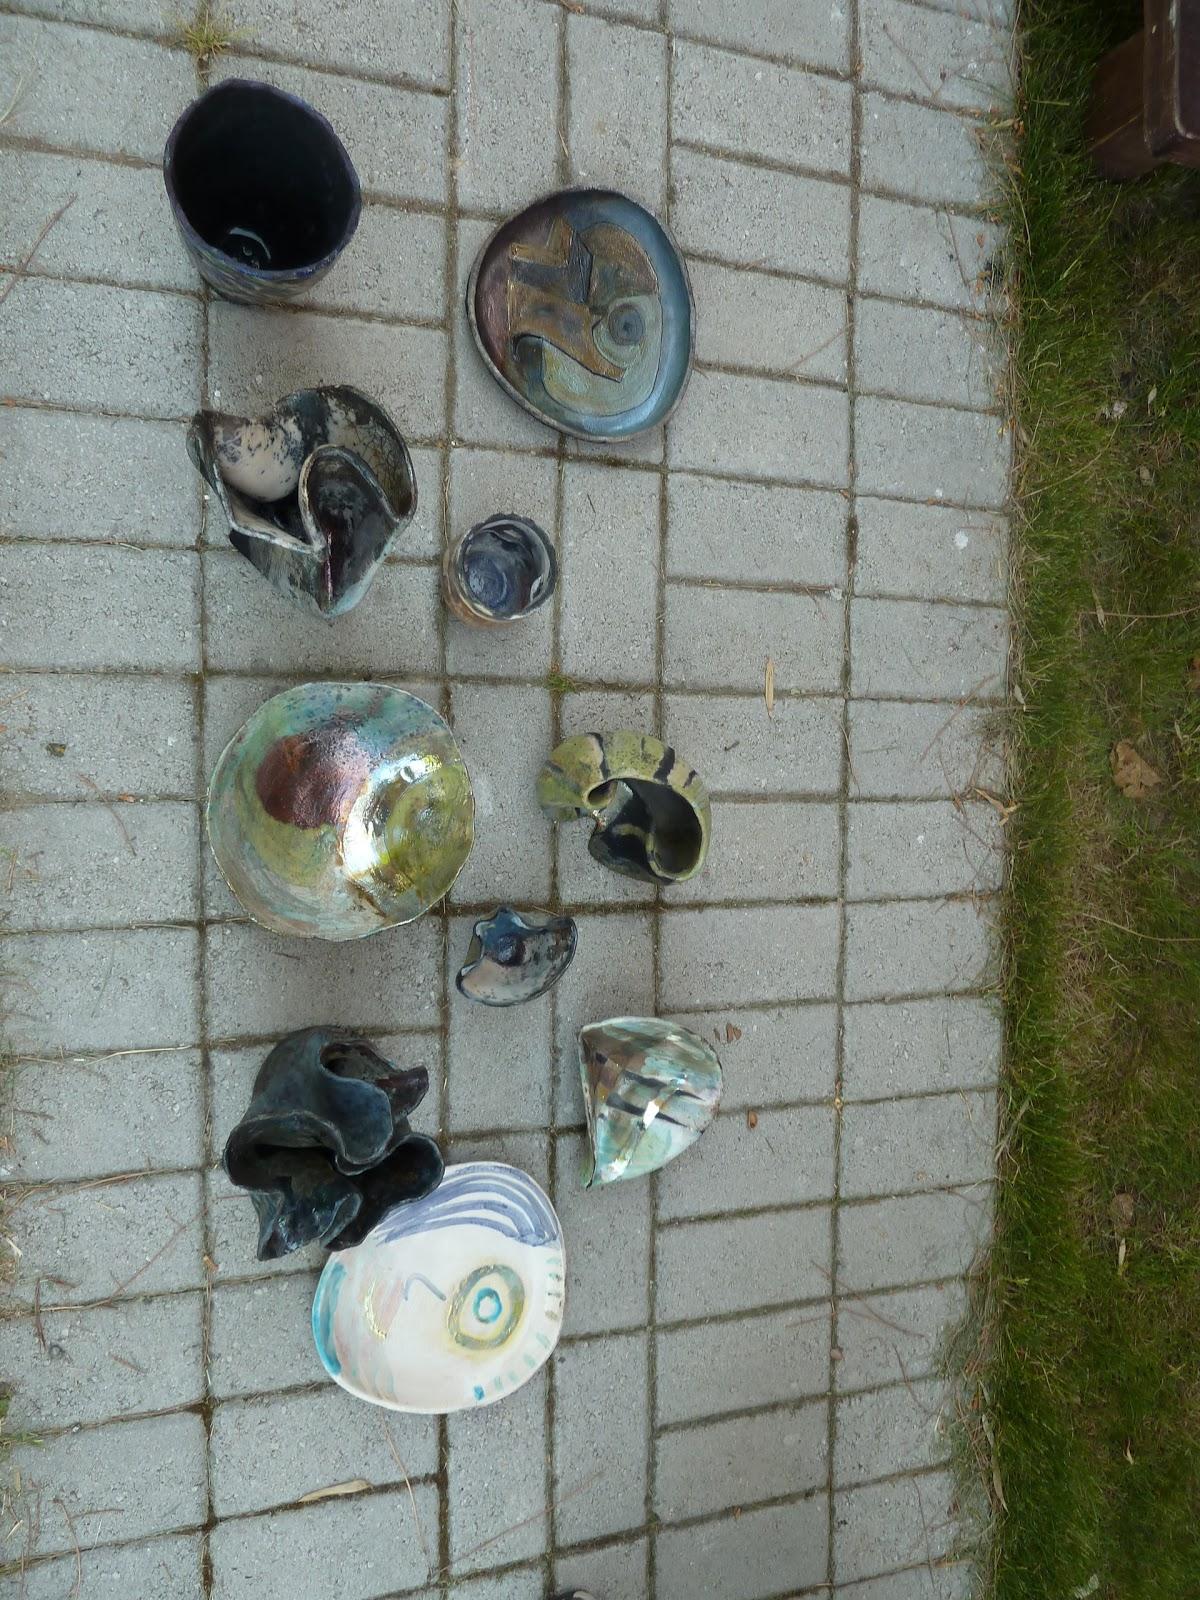 Chisato ceramica curso de raku con esmaltes mates en napoli for Curso ceramica barcelona